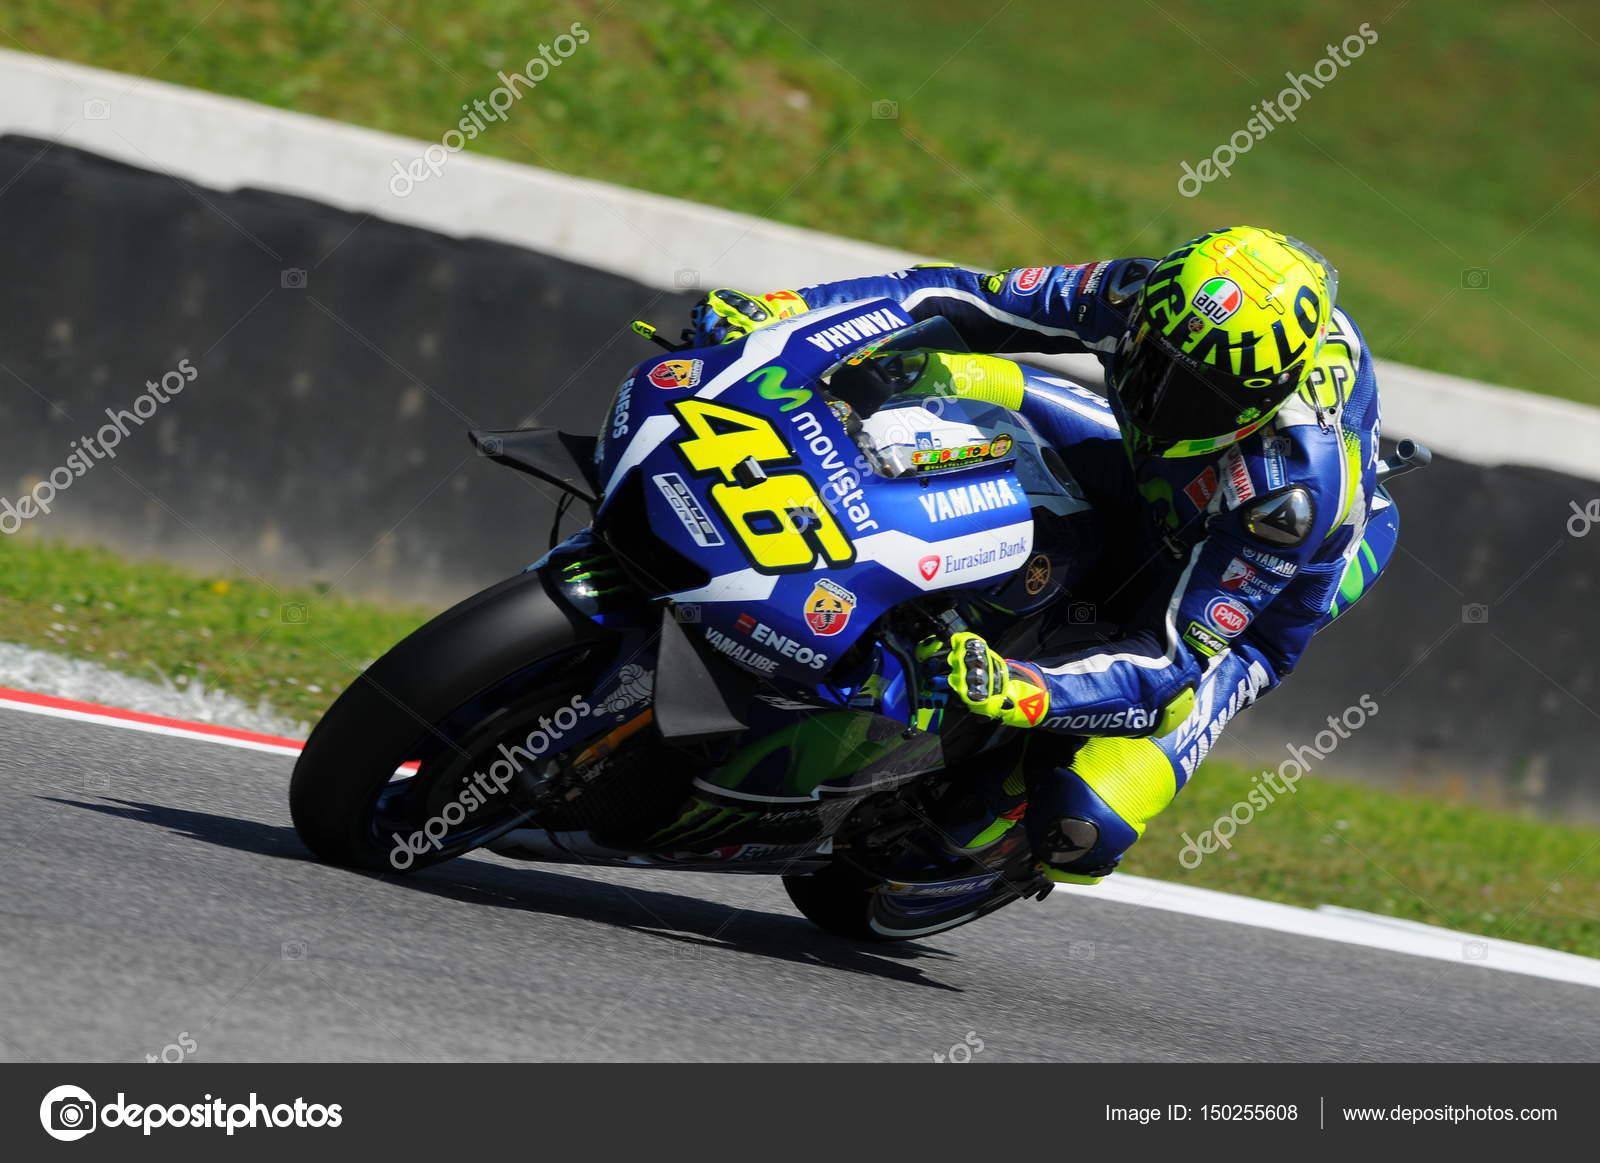 Mugello Italy May 21 Italian Yamaha Rider Valentino Rossi At